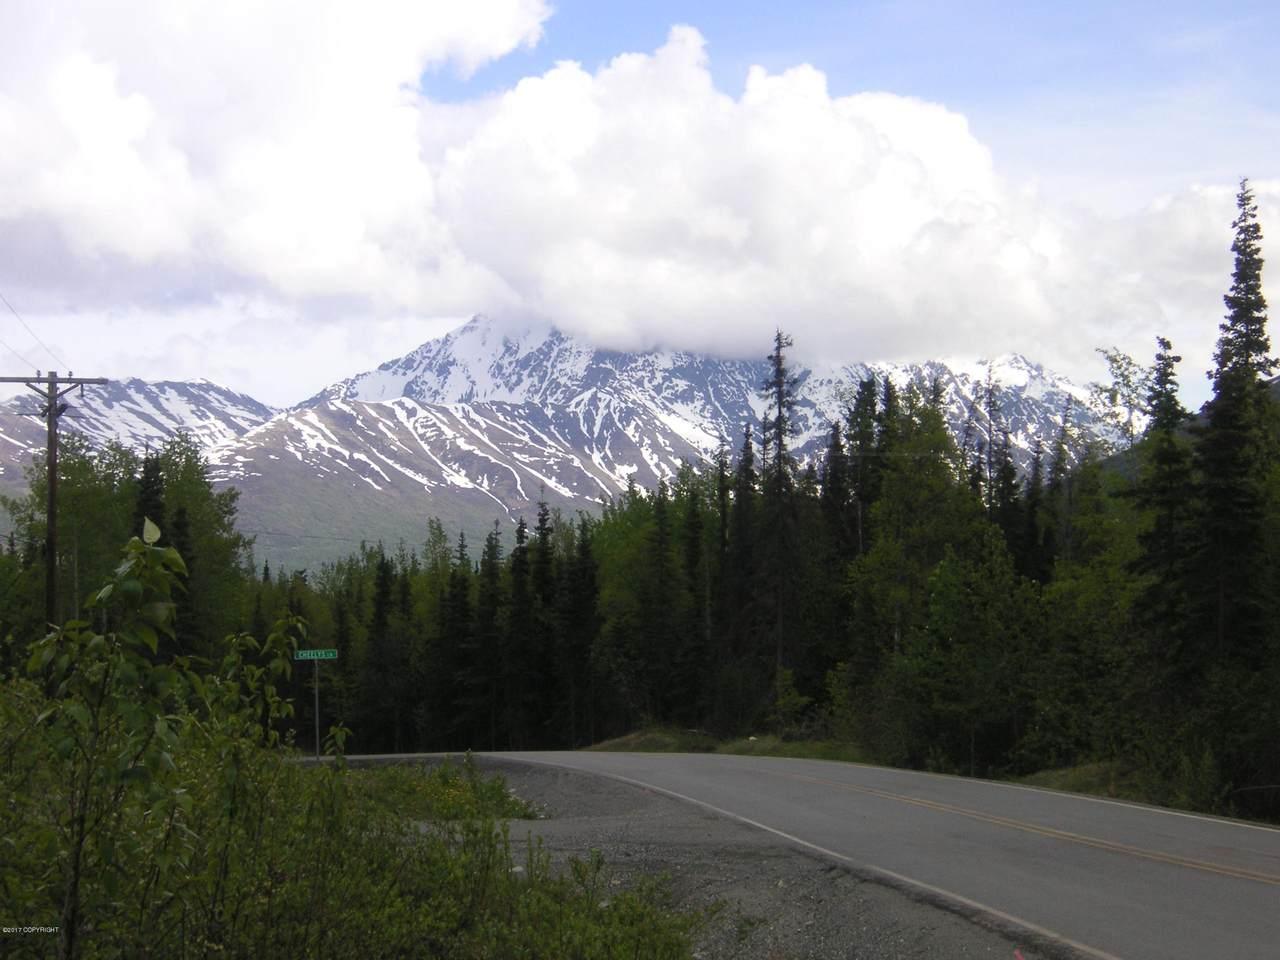 https://bt-photos.global.ssl.fastly.net/alaska/1280_boomver_1_17-11584-2.jpg